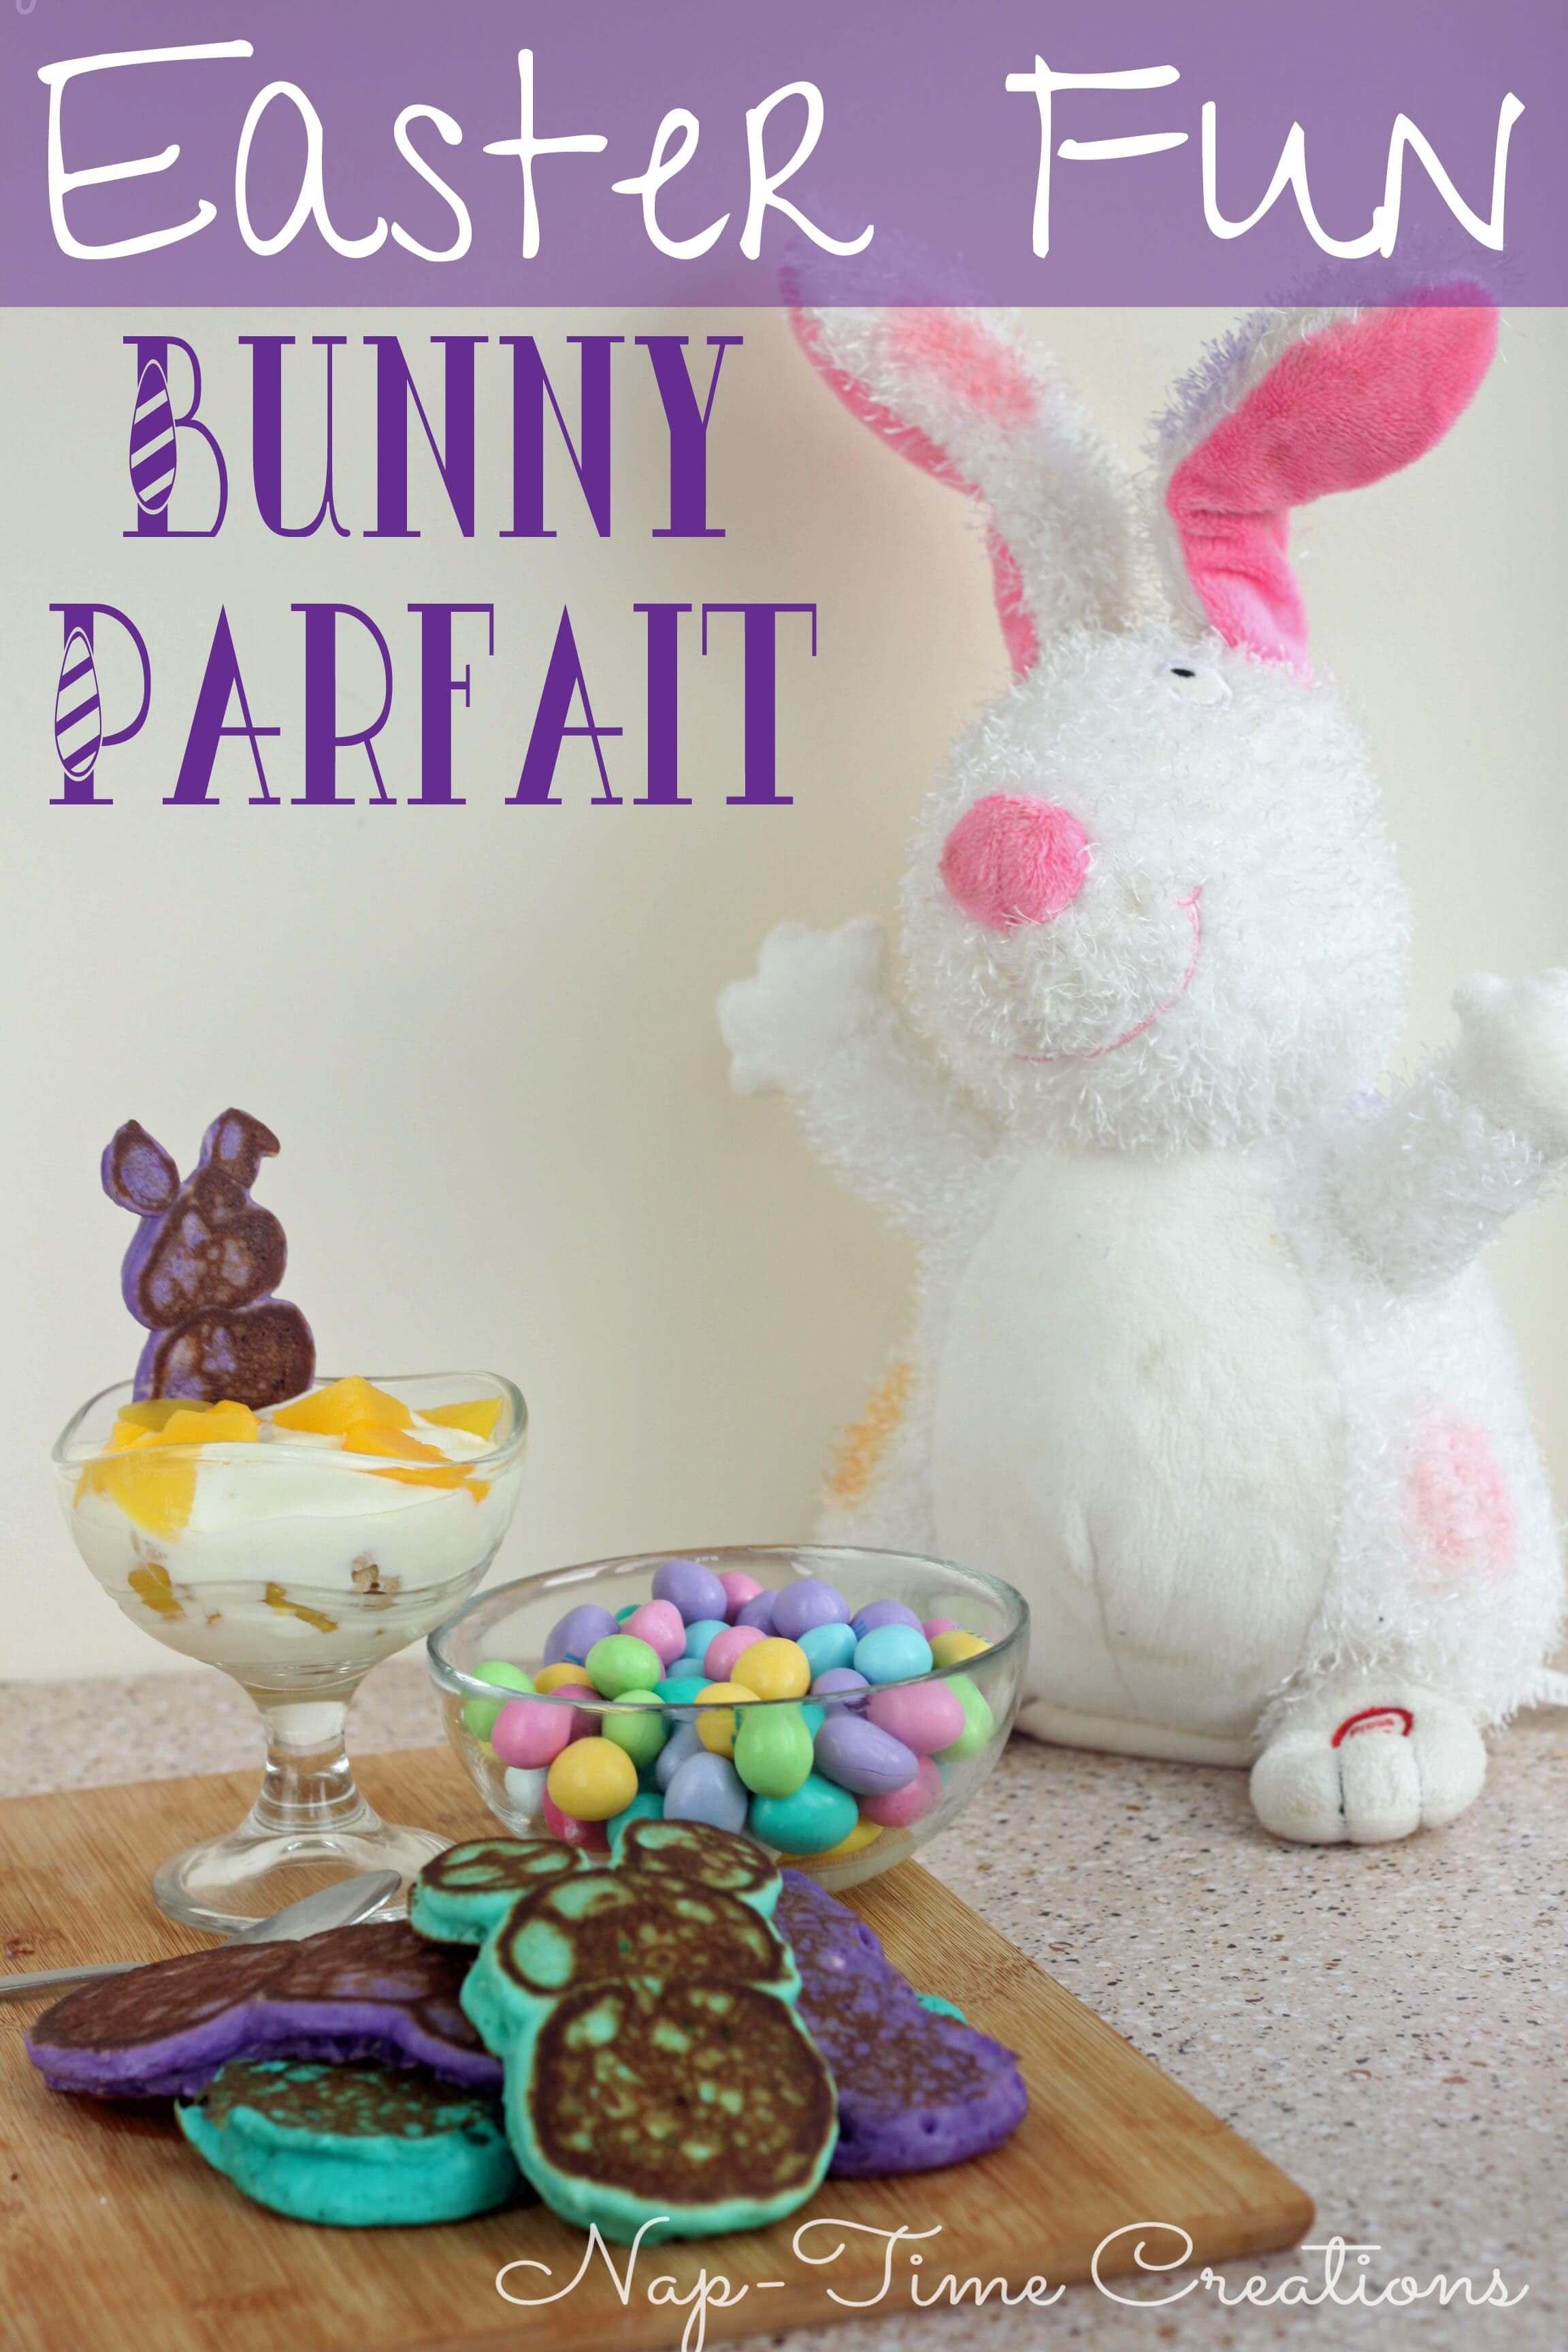 bunny parfaits5